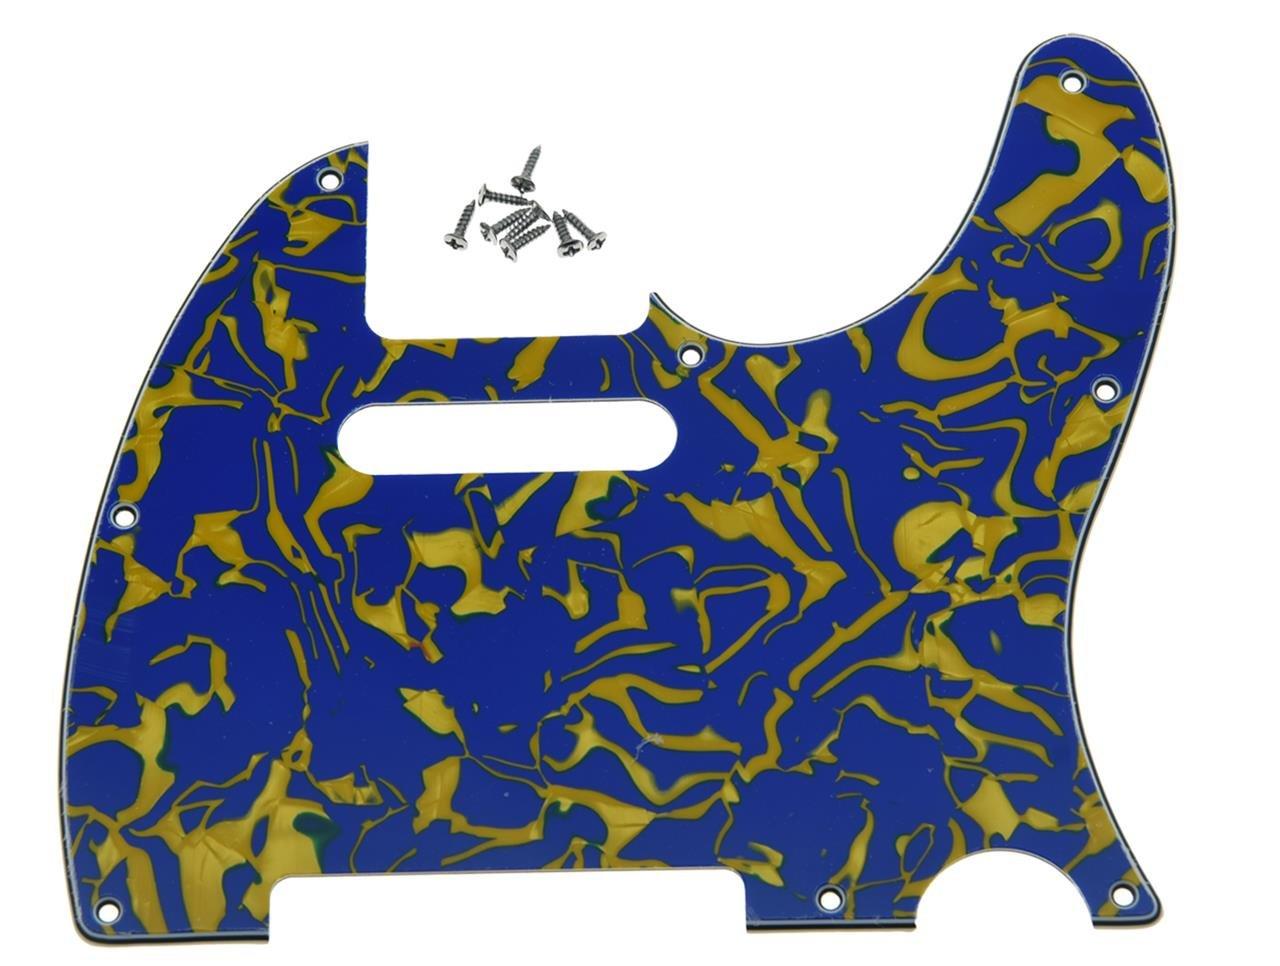 KAISH 8 Hole Tele Guitar Pickguard Scratch Plate fits USA/Mexican Fender Telecaster Dark Tortoise Kaish Music K964